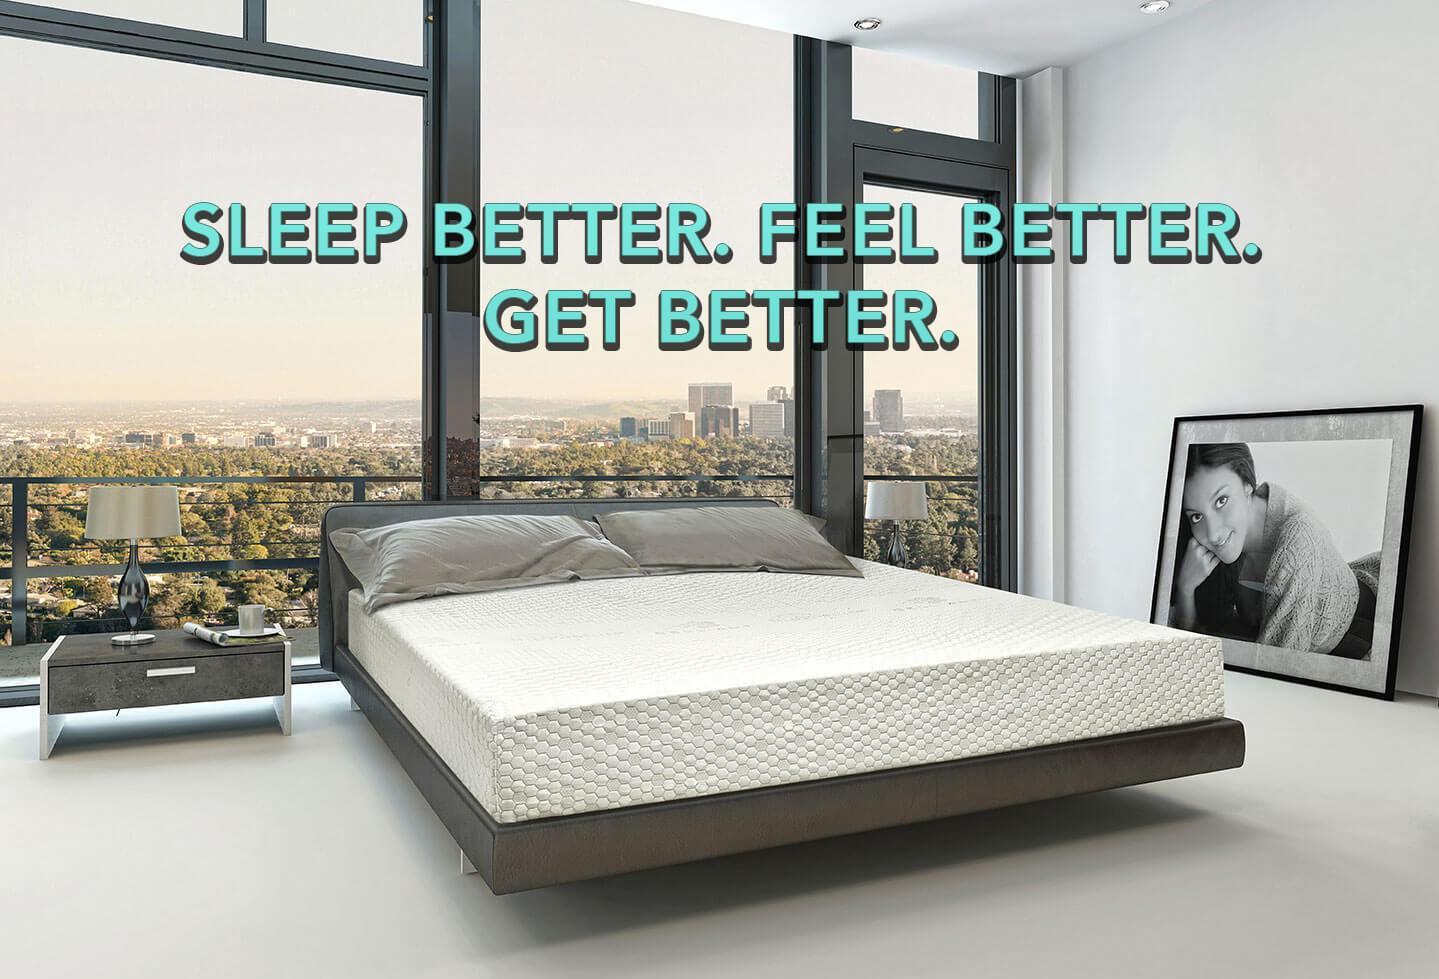 Sleep Better. Feel Better. Get Better